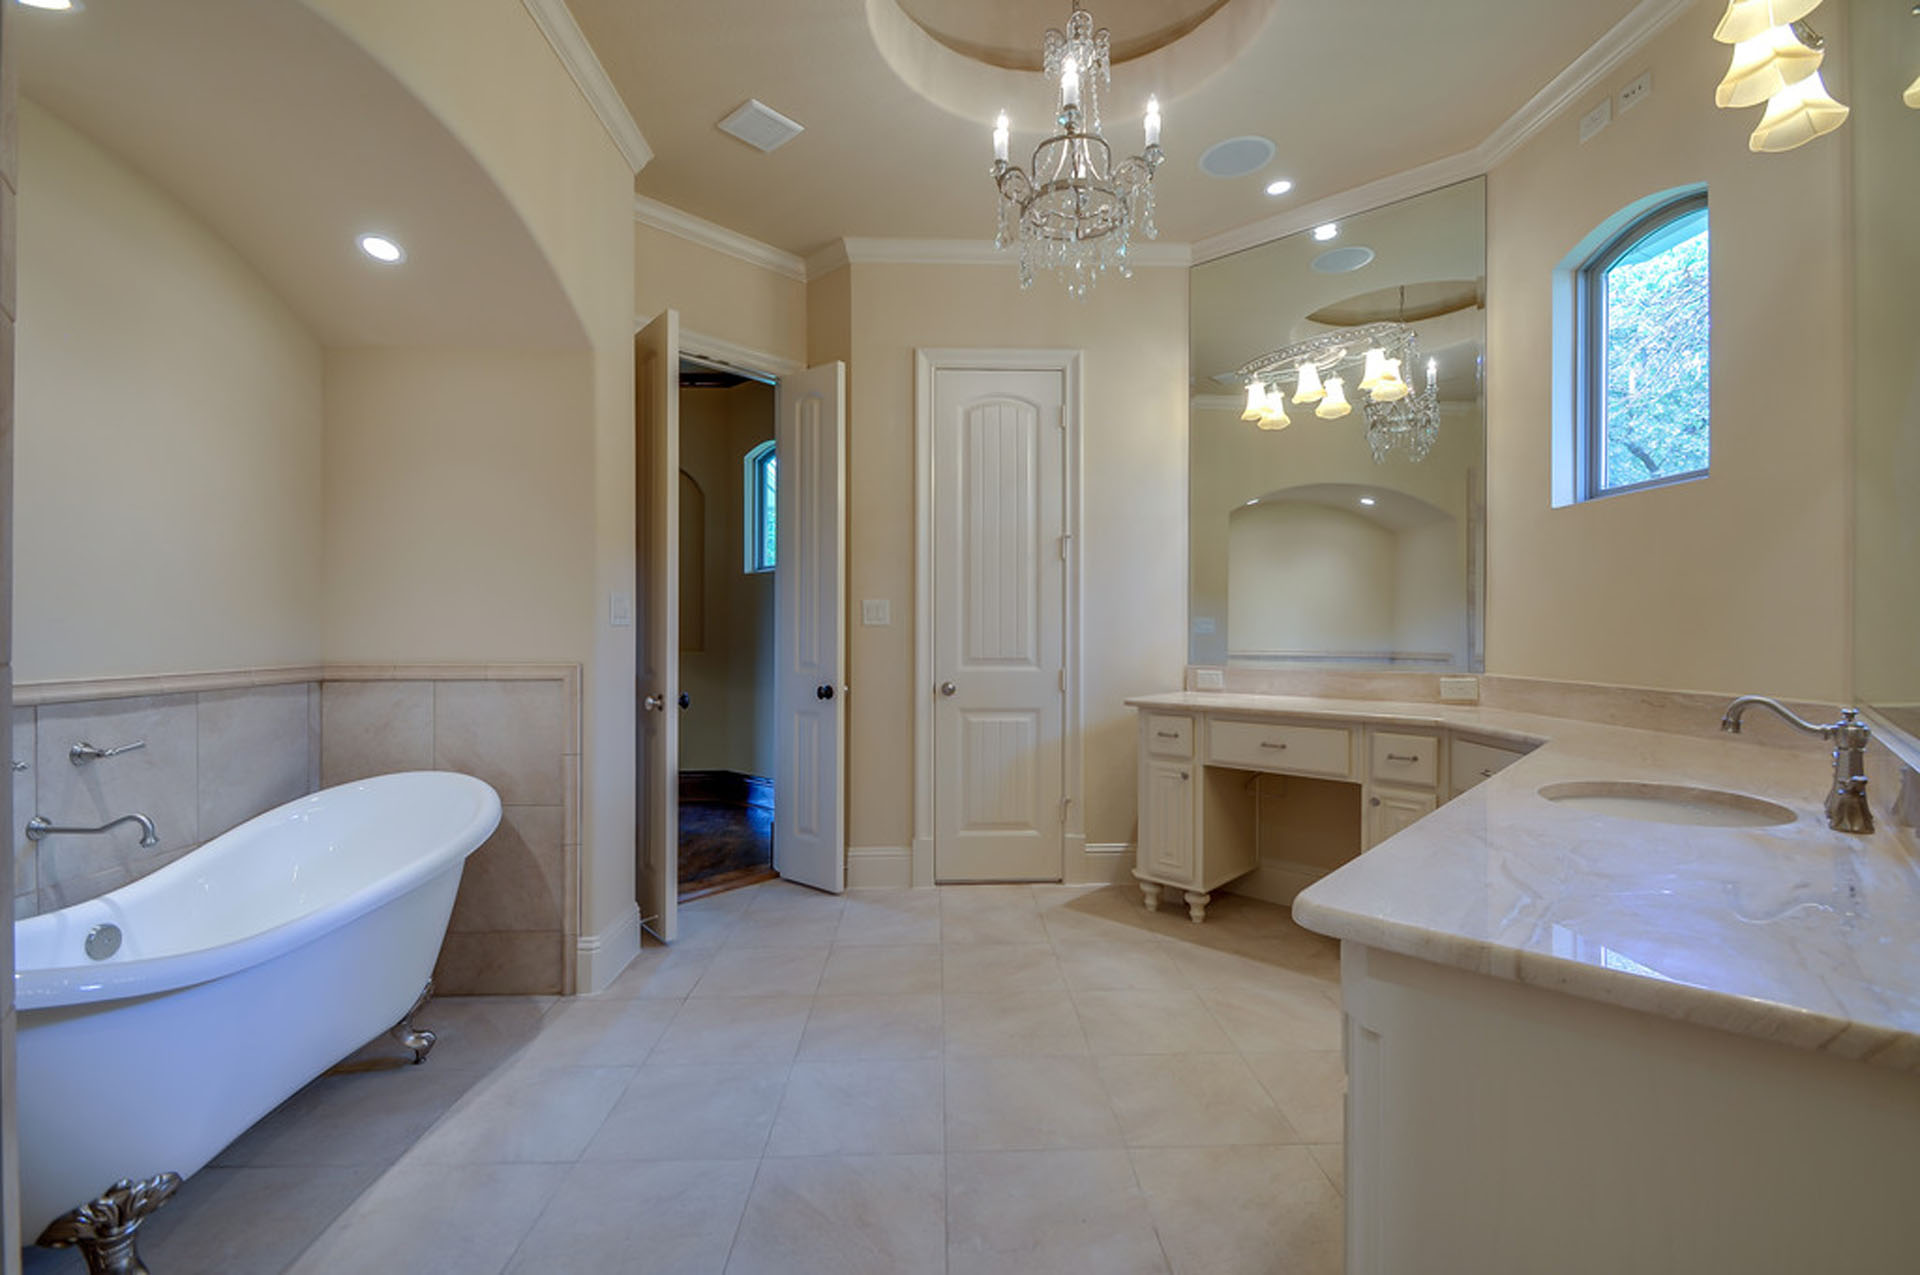 North Texas Custom Homes - Master Bath Lighting Tips